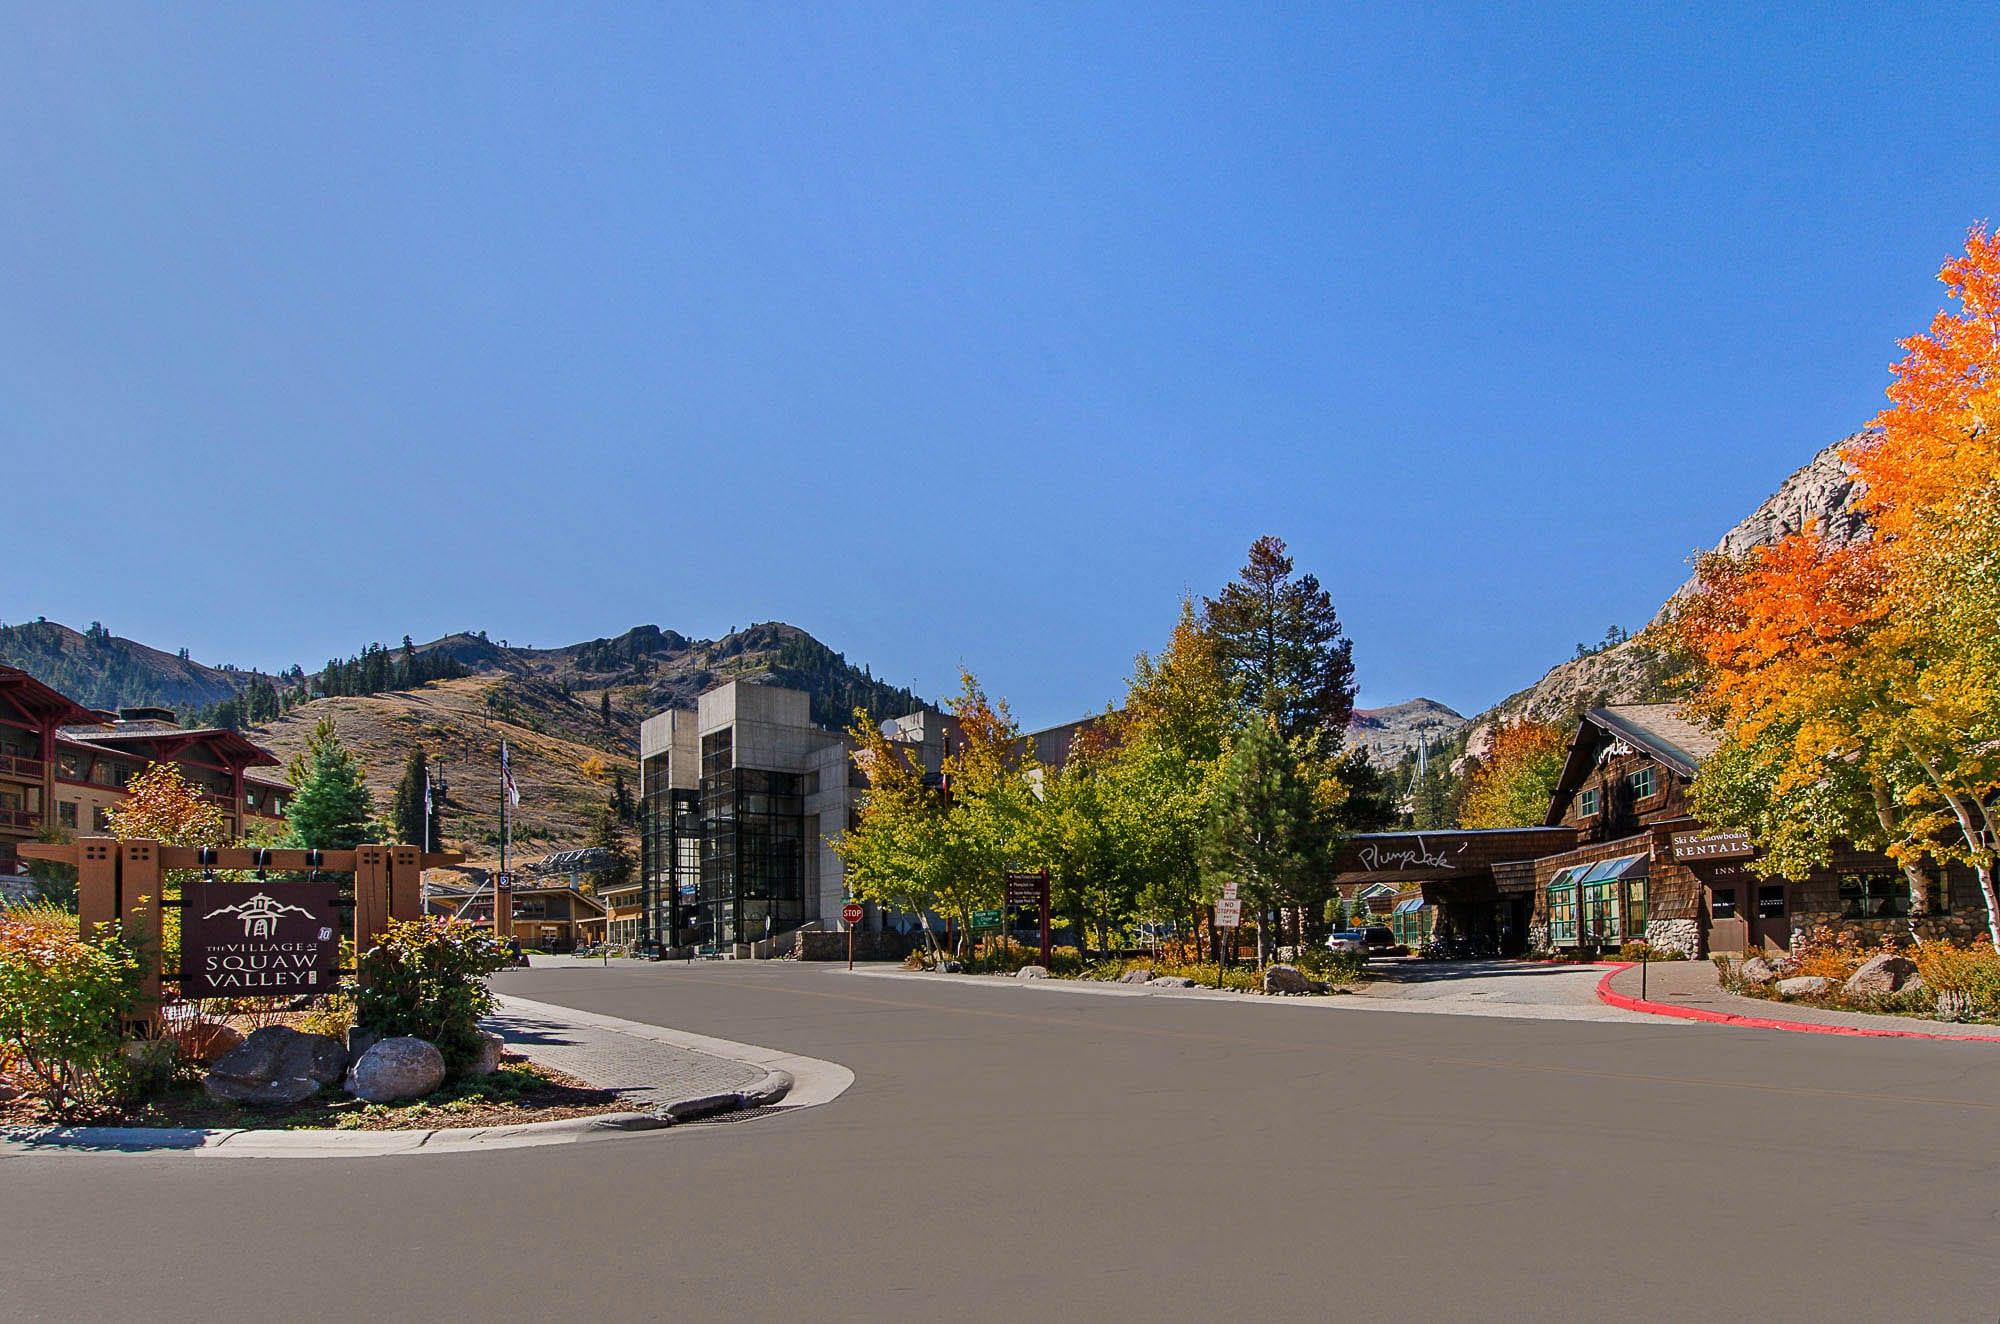 R_R Squaw Valley Entrance 00